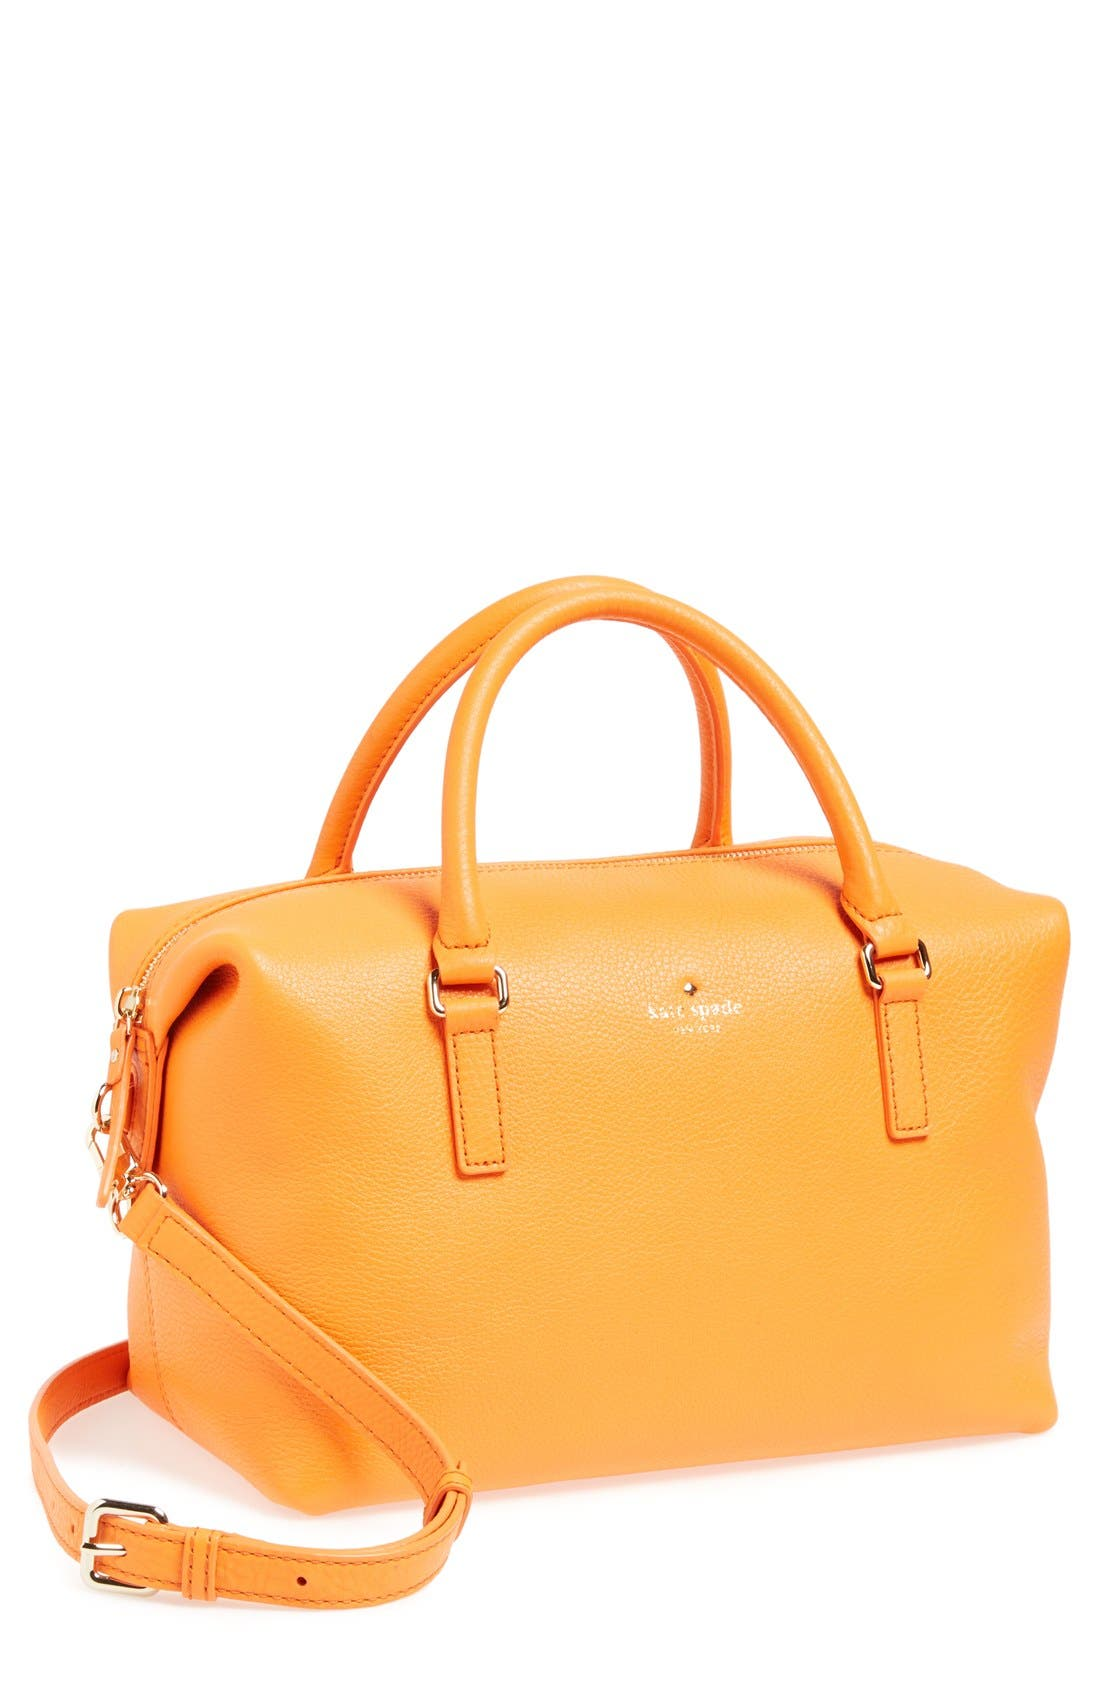 Main Image - kate spade new york 'henry lane - emmy' satchel